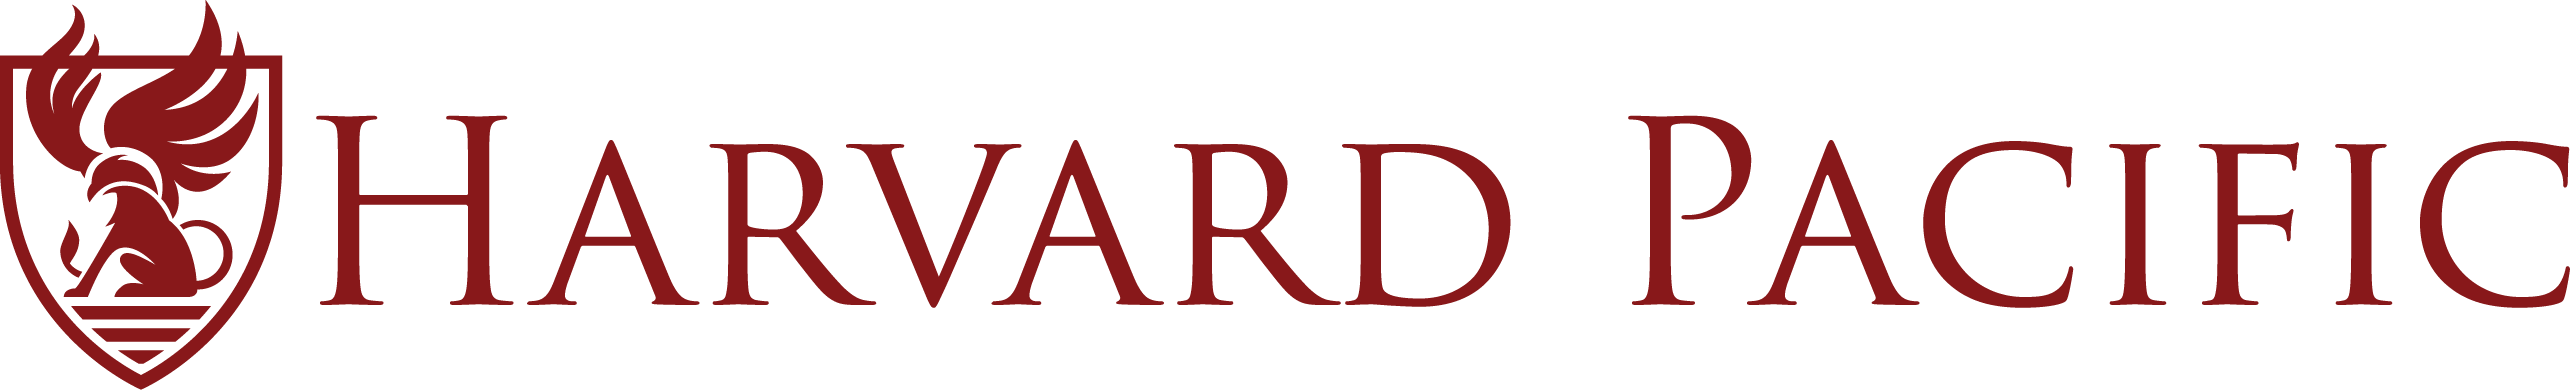 Harvard Pacific